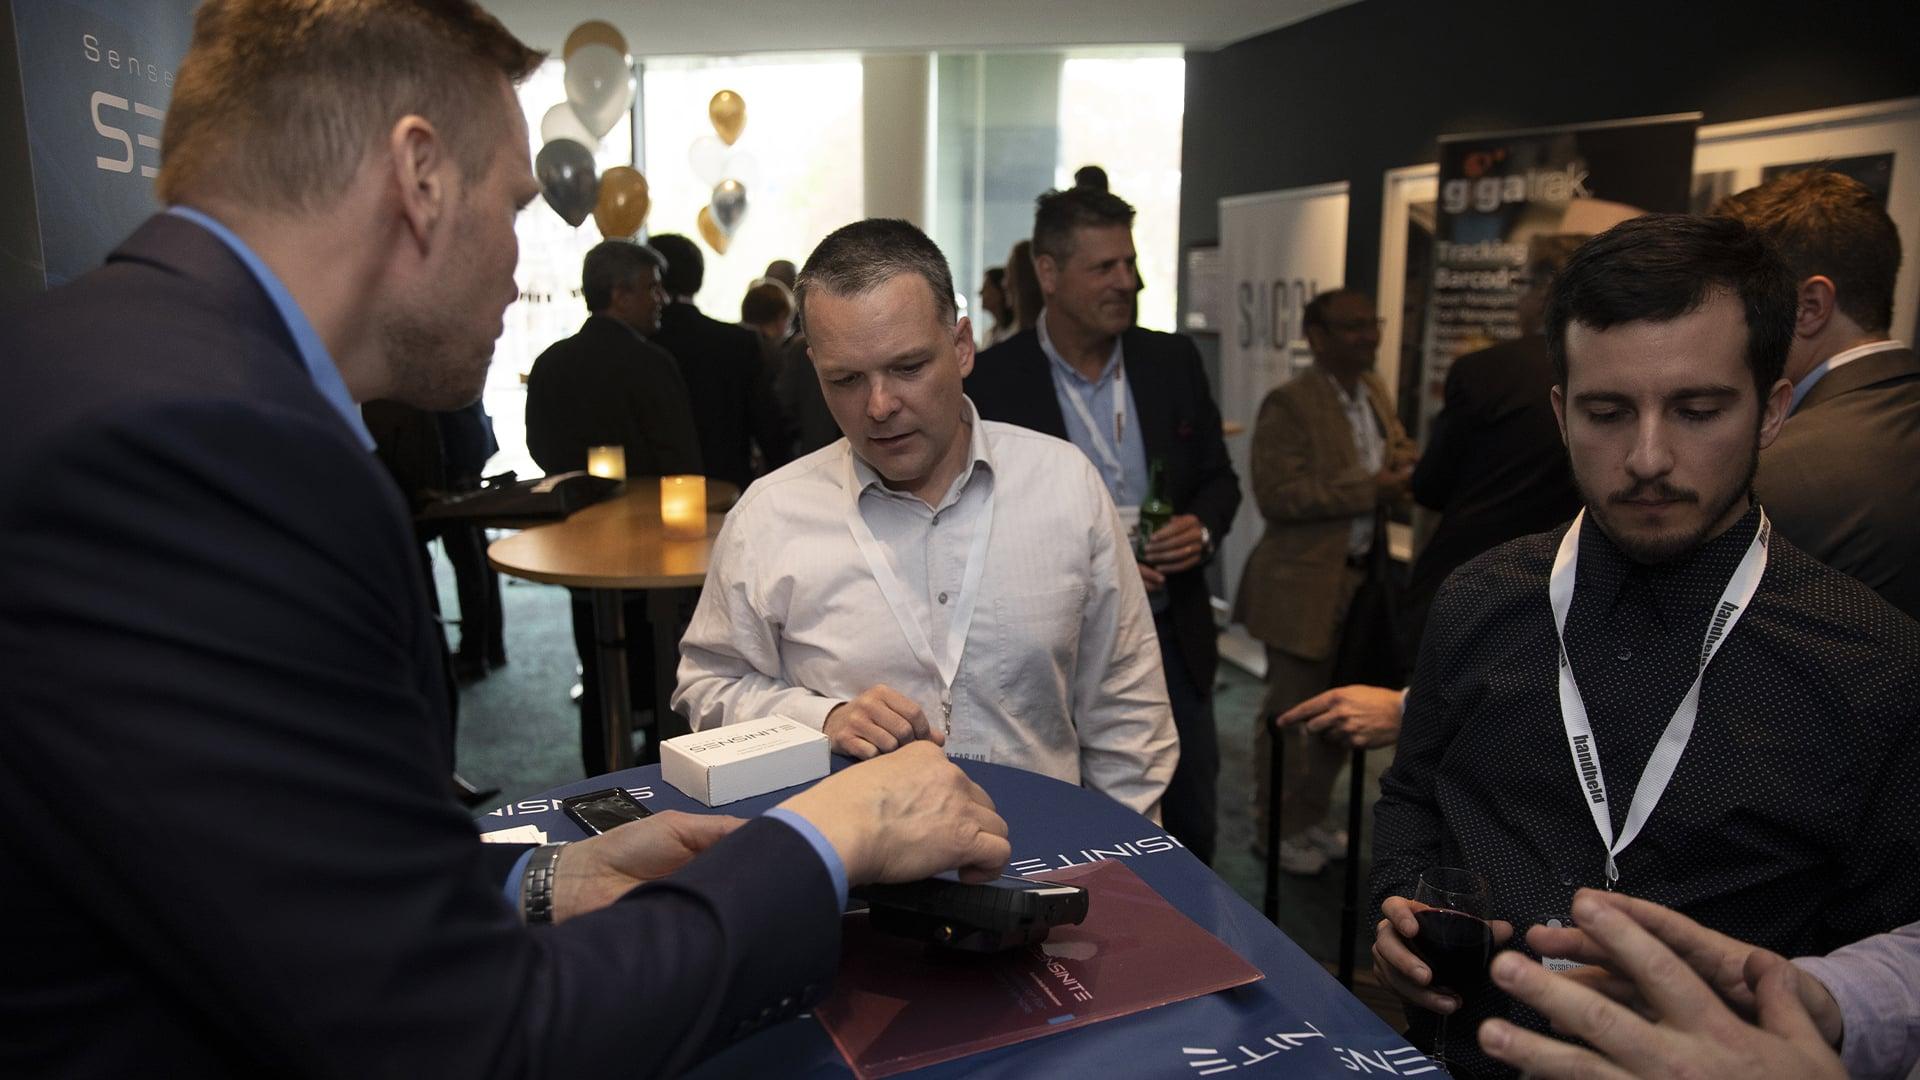 handheld business partner conference showcase area